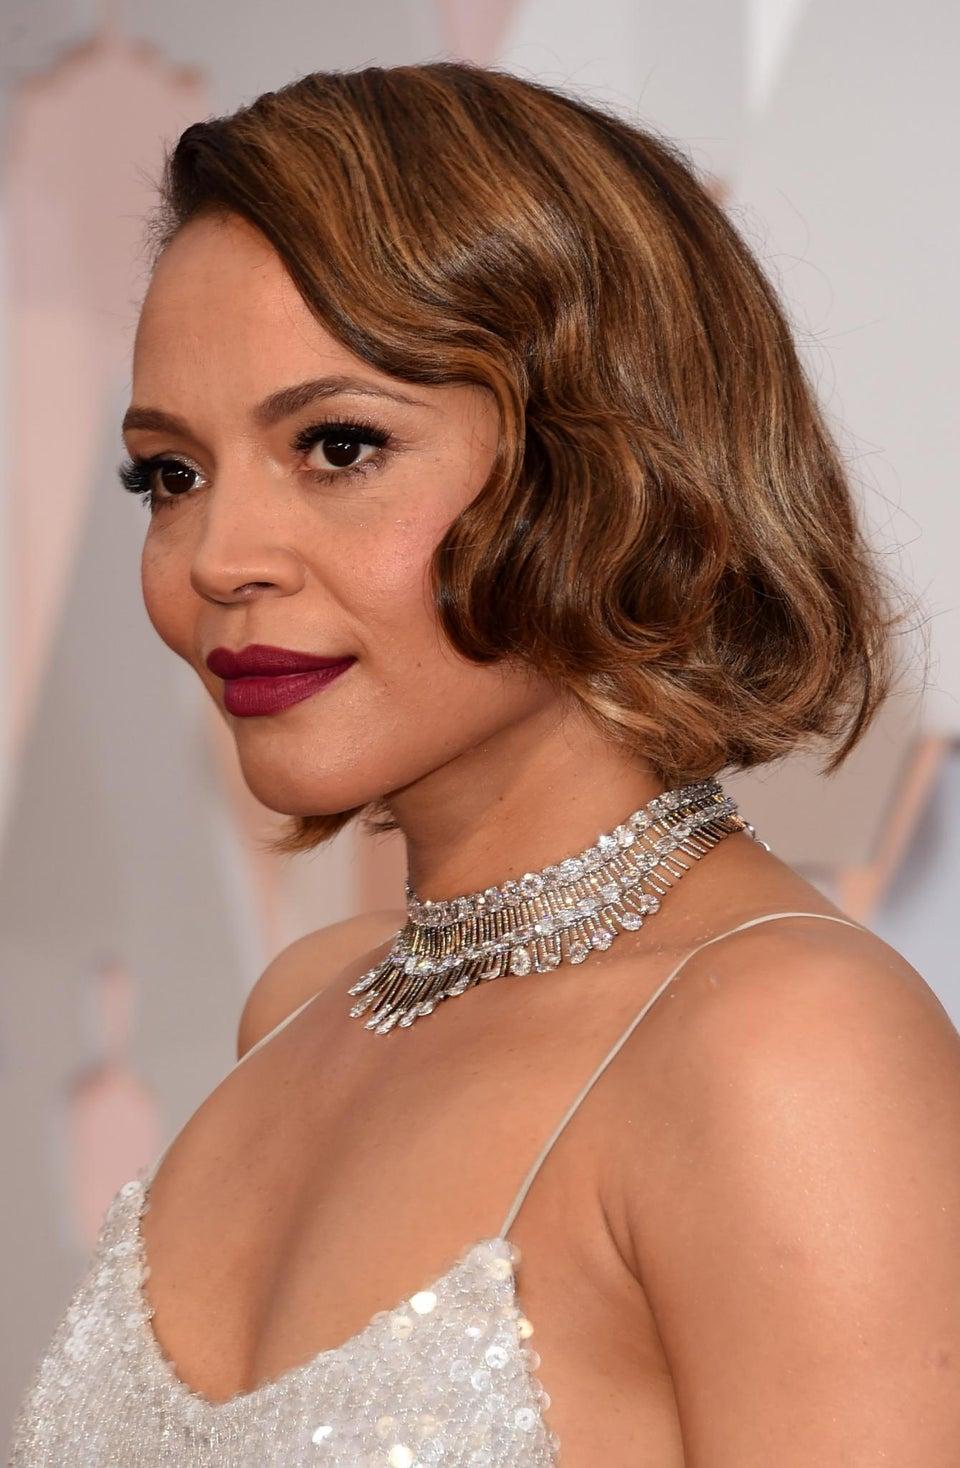 Get Carmen Ejogo's Complete 2015 Academy Awards Look